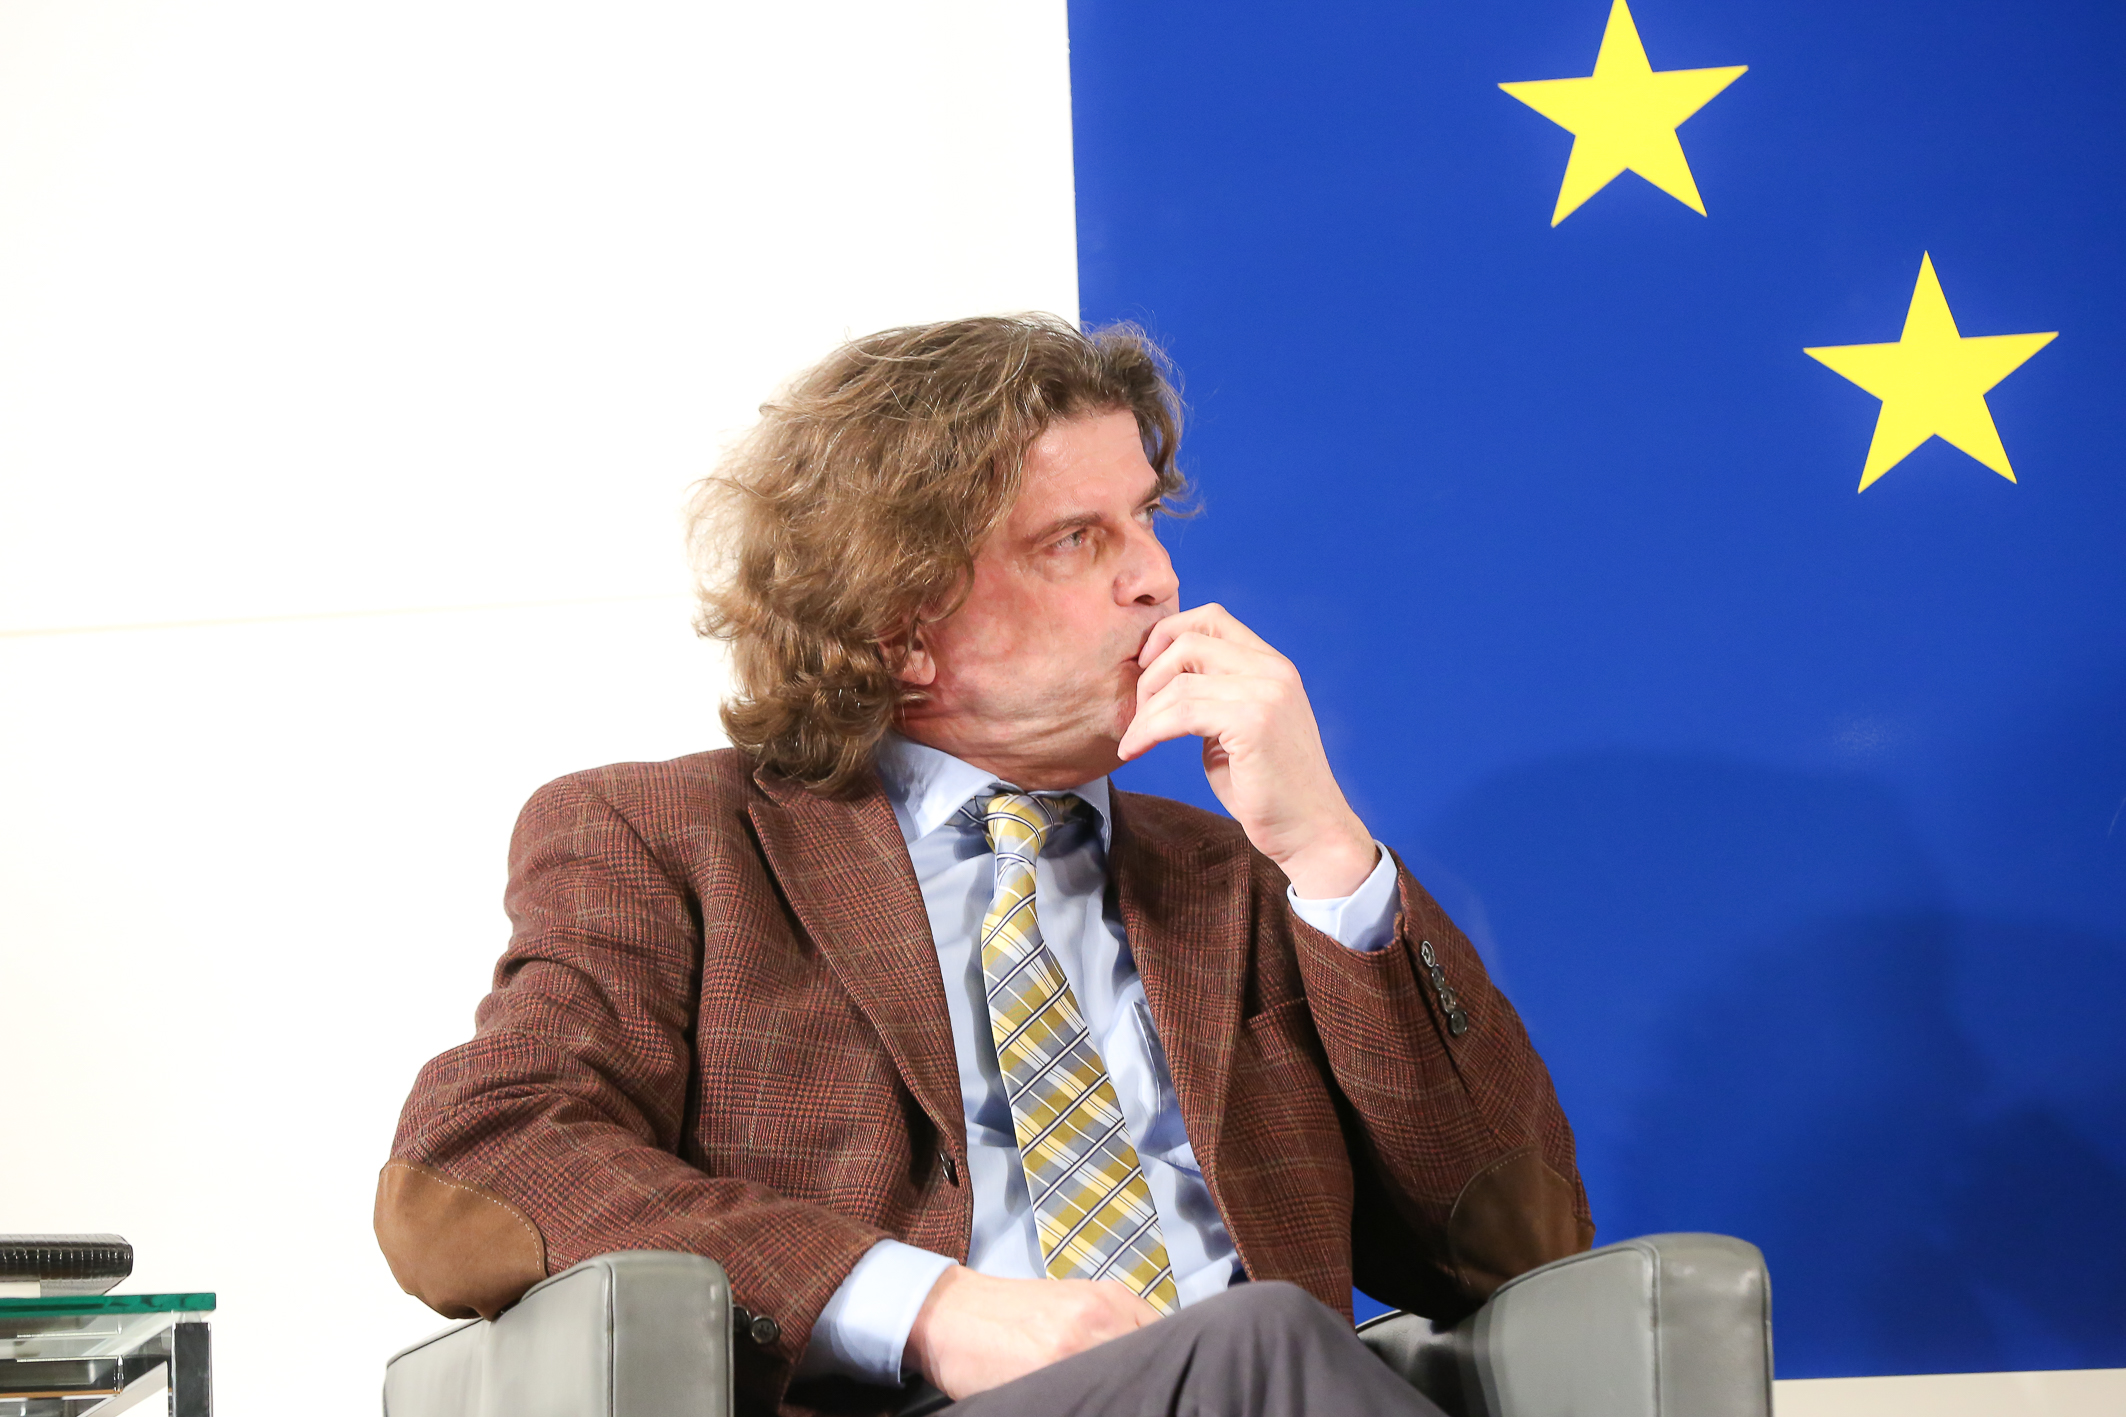 europadialog_thomas-mayer_a21_8762__credit_moni-fellner